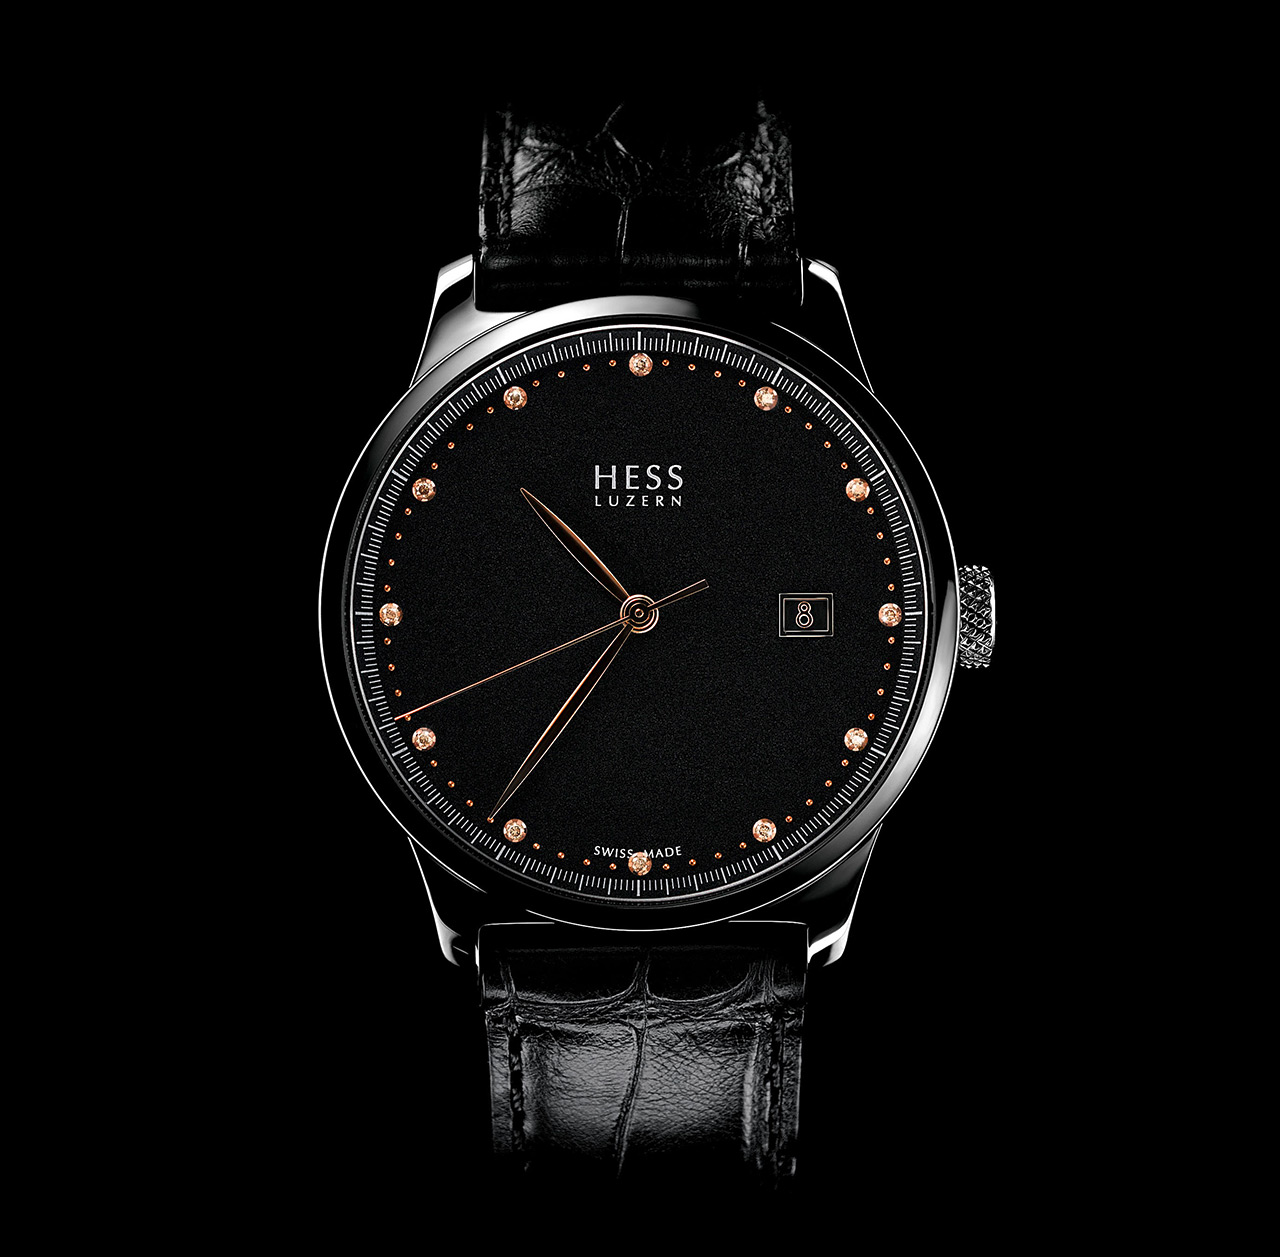 hess-uhr-automatik-two-2-schwarz-rosegold-braune-diamanten